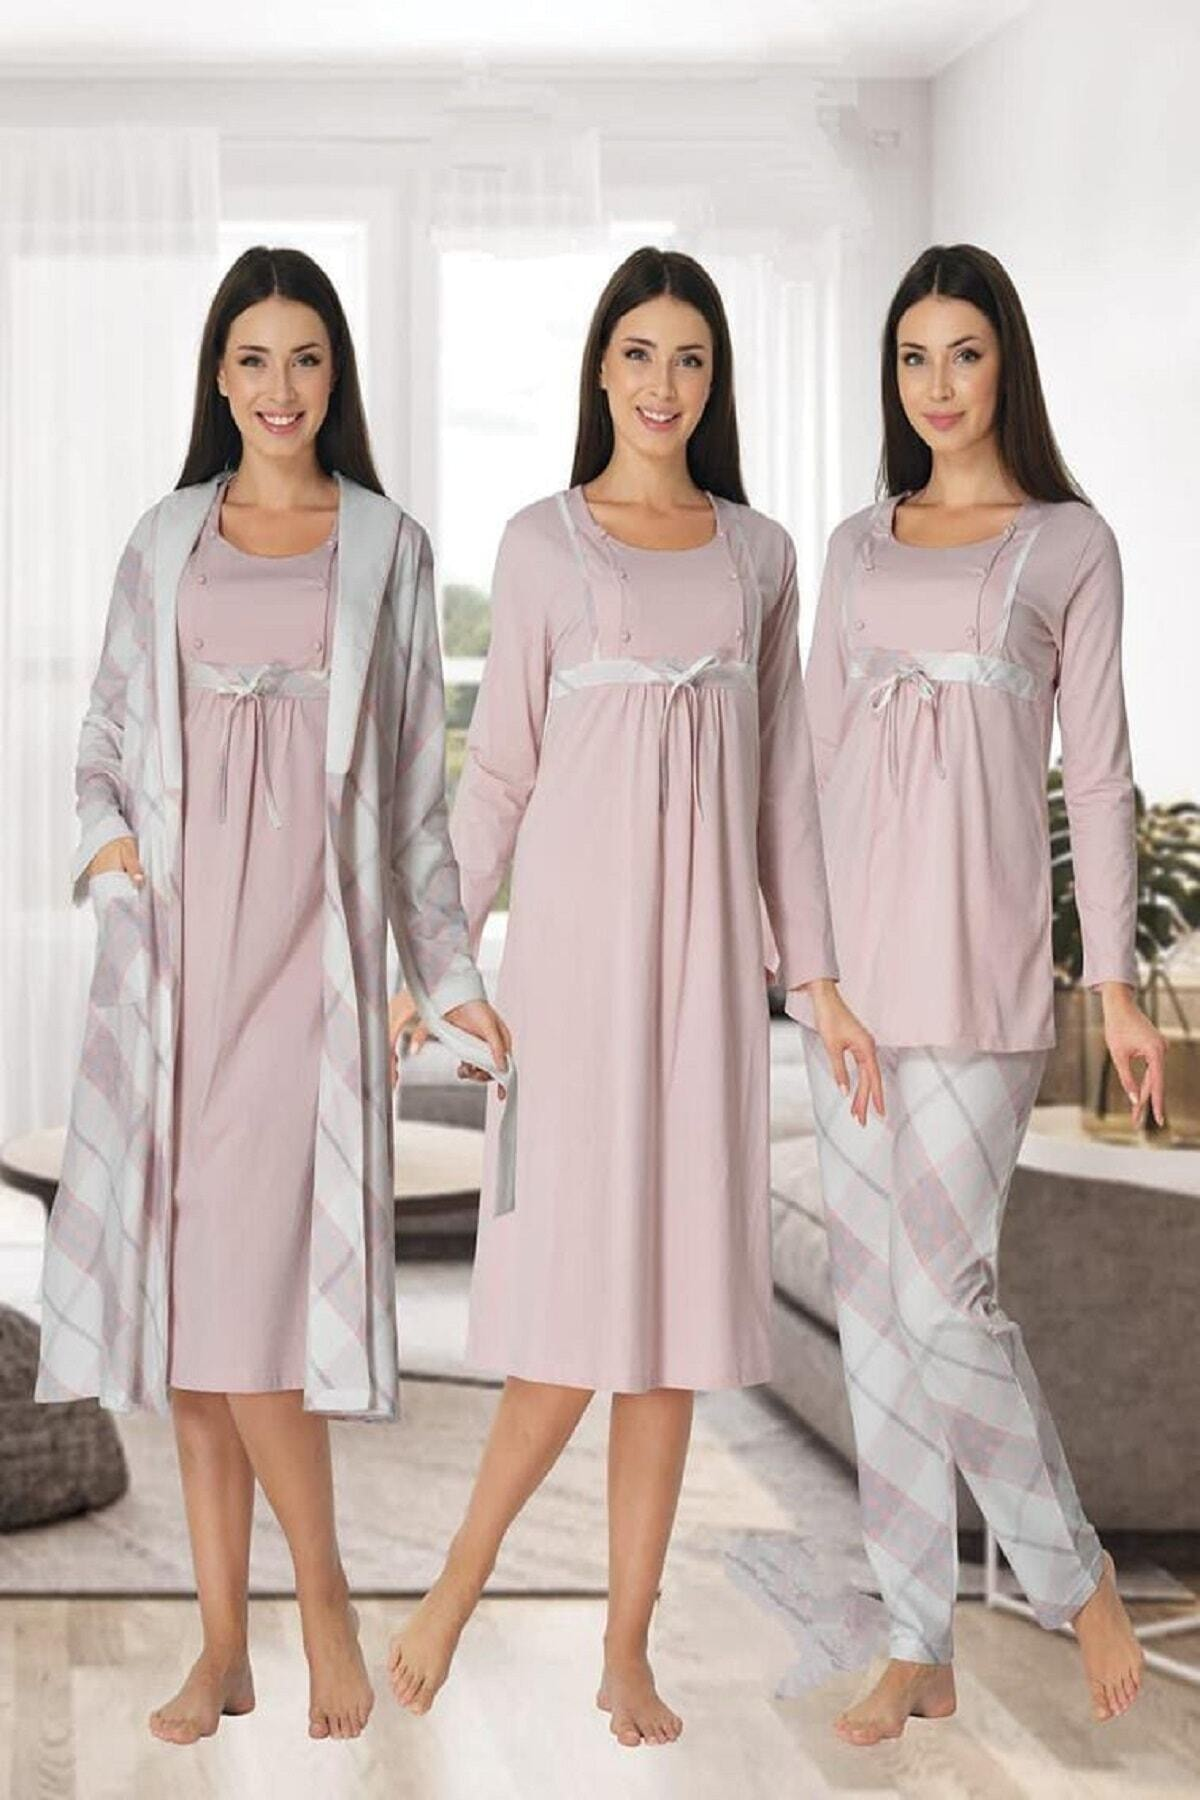 Lohusa Dünyasi Women Plaid Long Sleeve Nightgown Pajamas Set 4-Piece Gray Red Gray Navy Blue Pink Blue enlarge